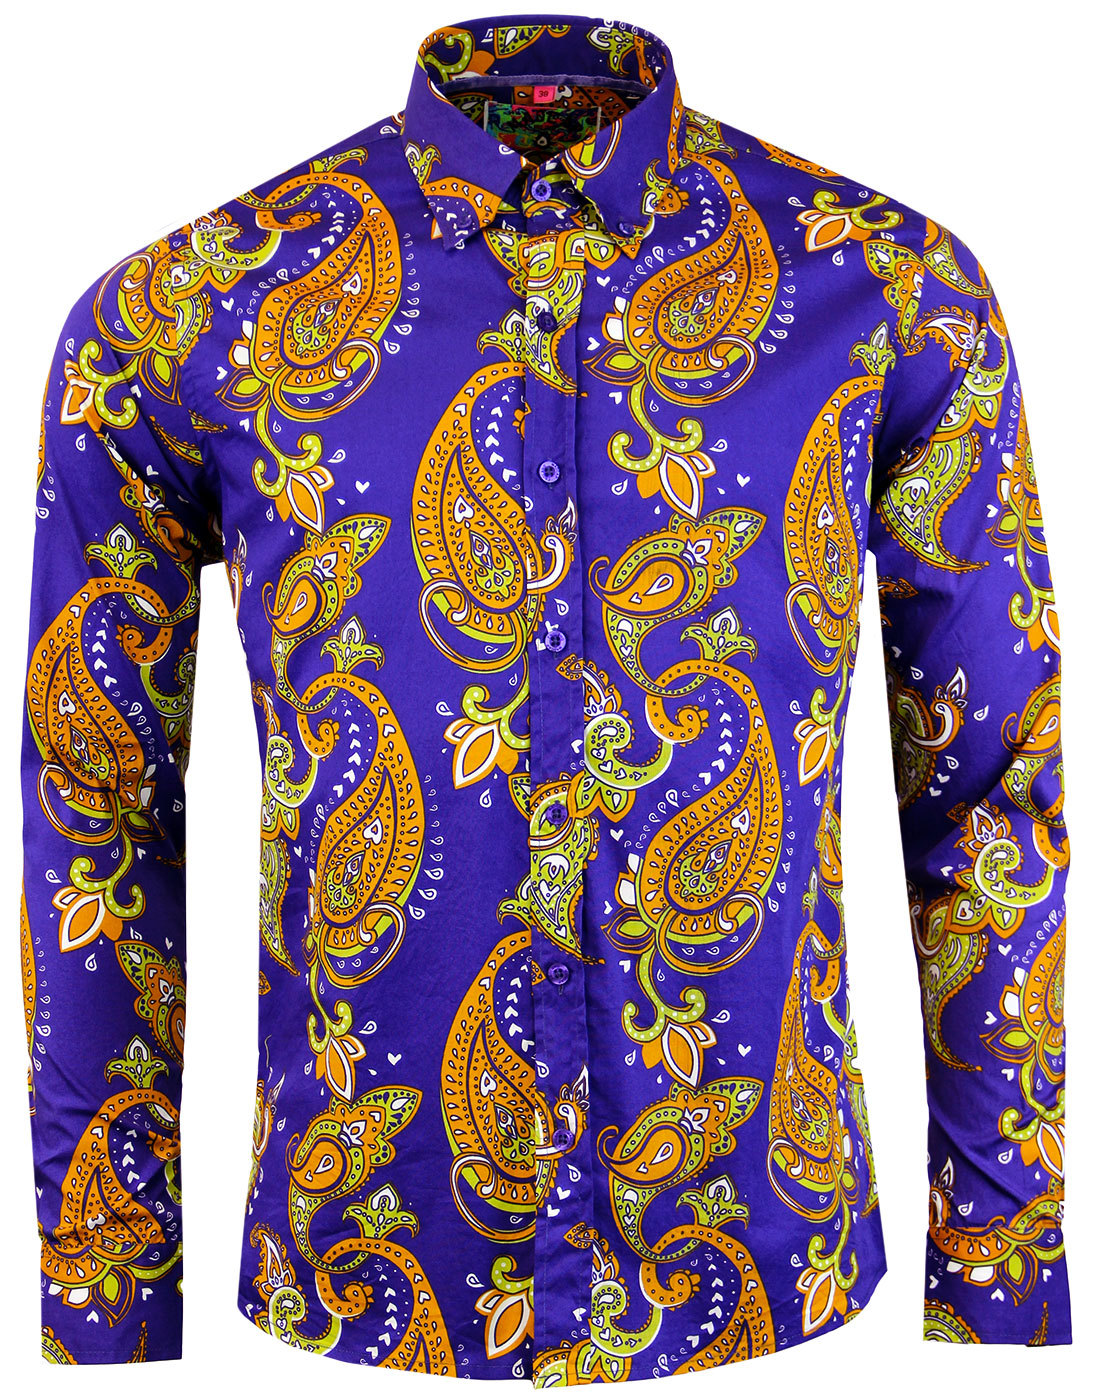 madcap england tanpura paisley trip 60s mod shirt